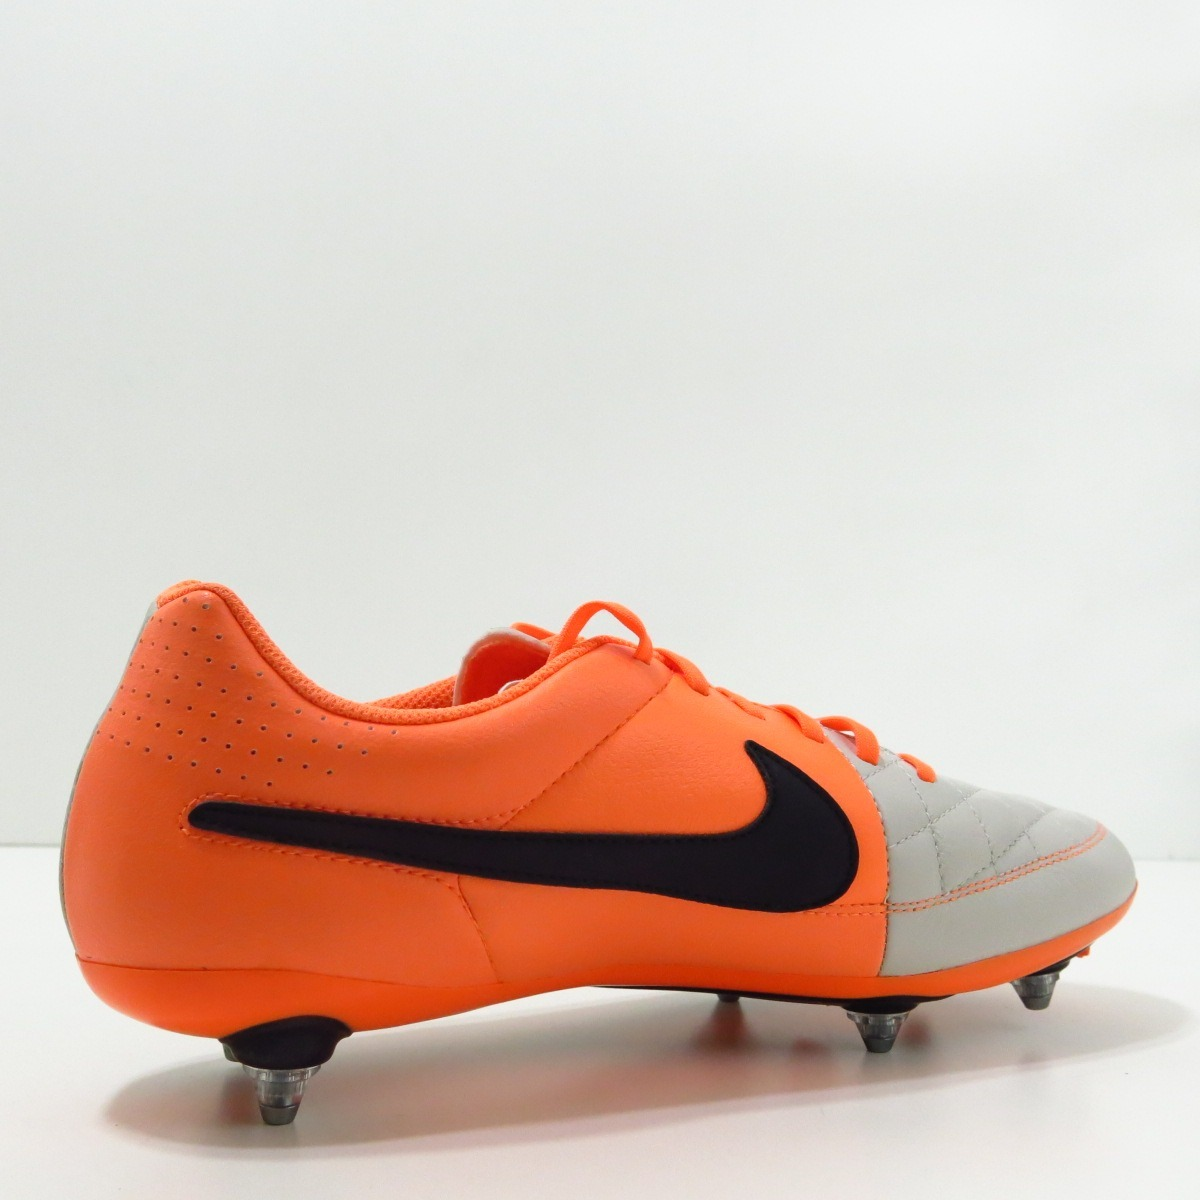 21d5abe098 Chuteira Nike Tiempo Genio Sg Couro Original Europeu - R  399